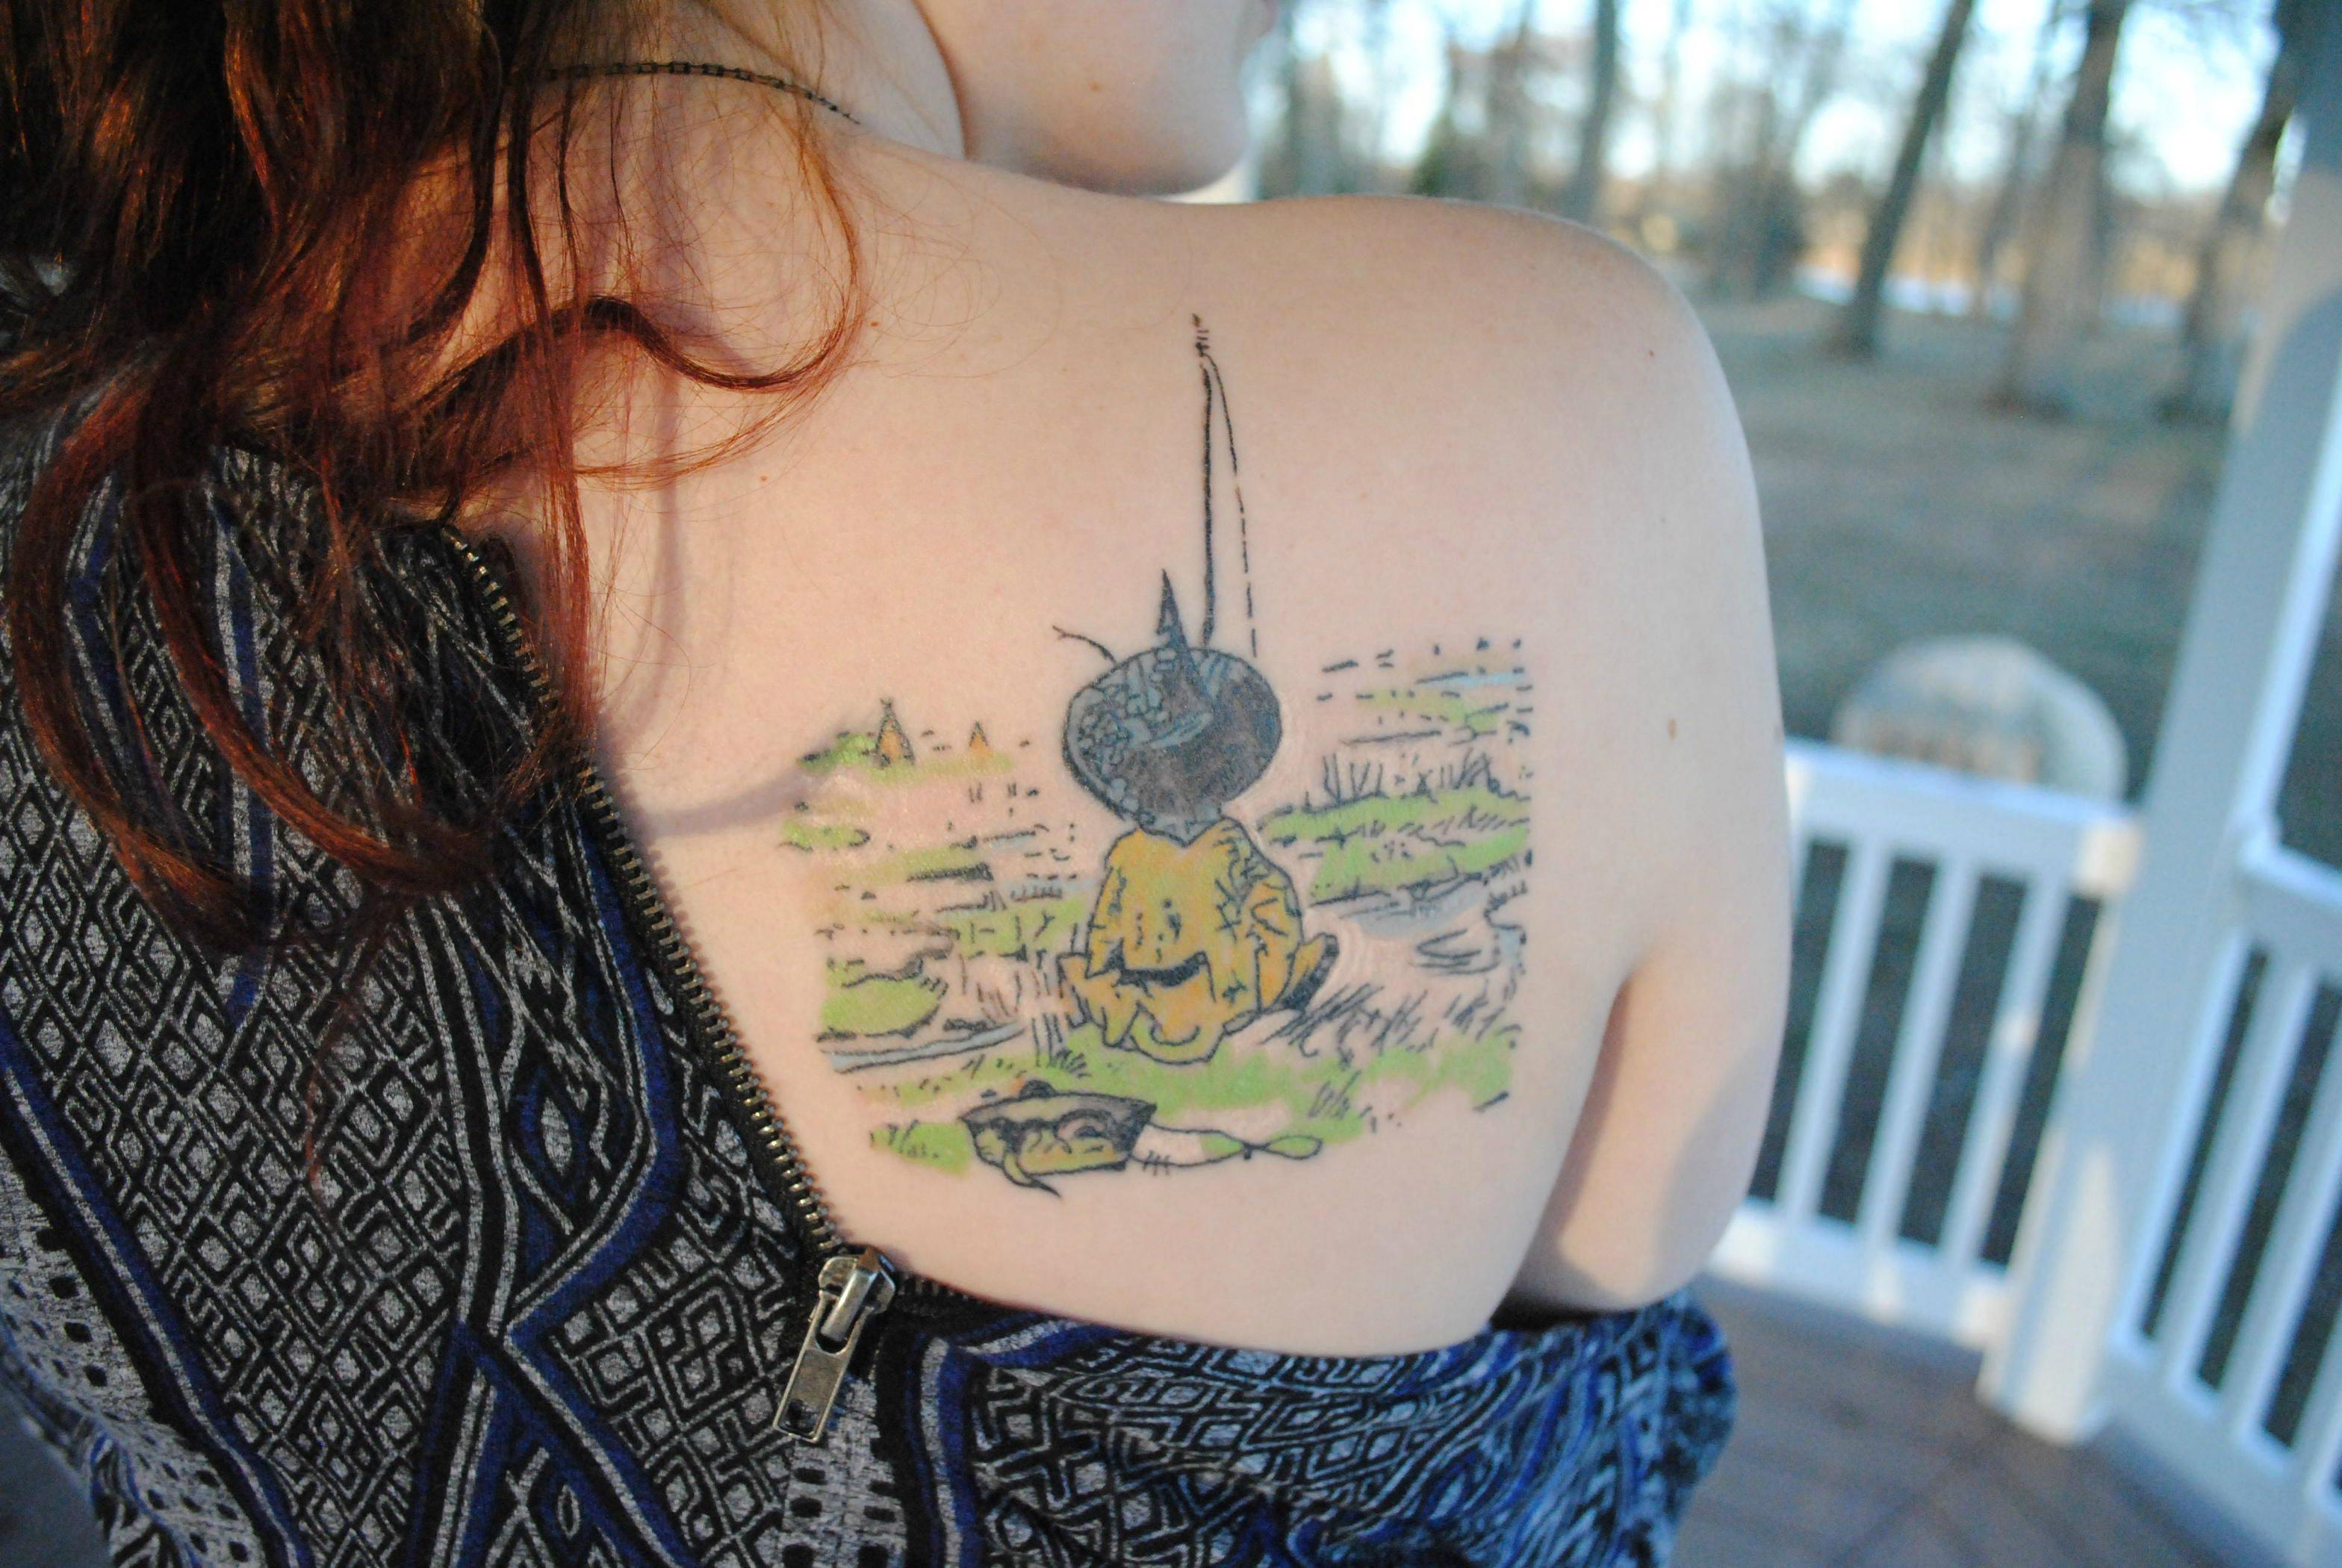 fa-de-lewis-tatua-paulama-nas-costas